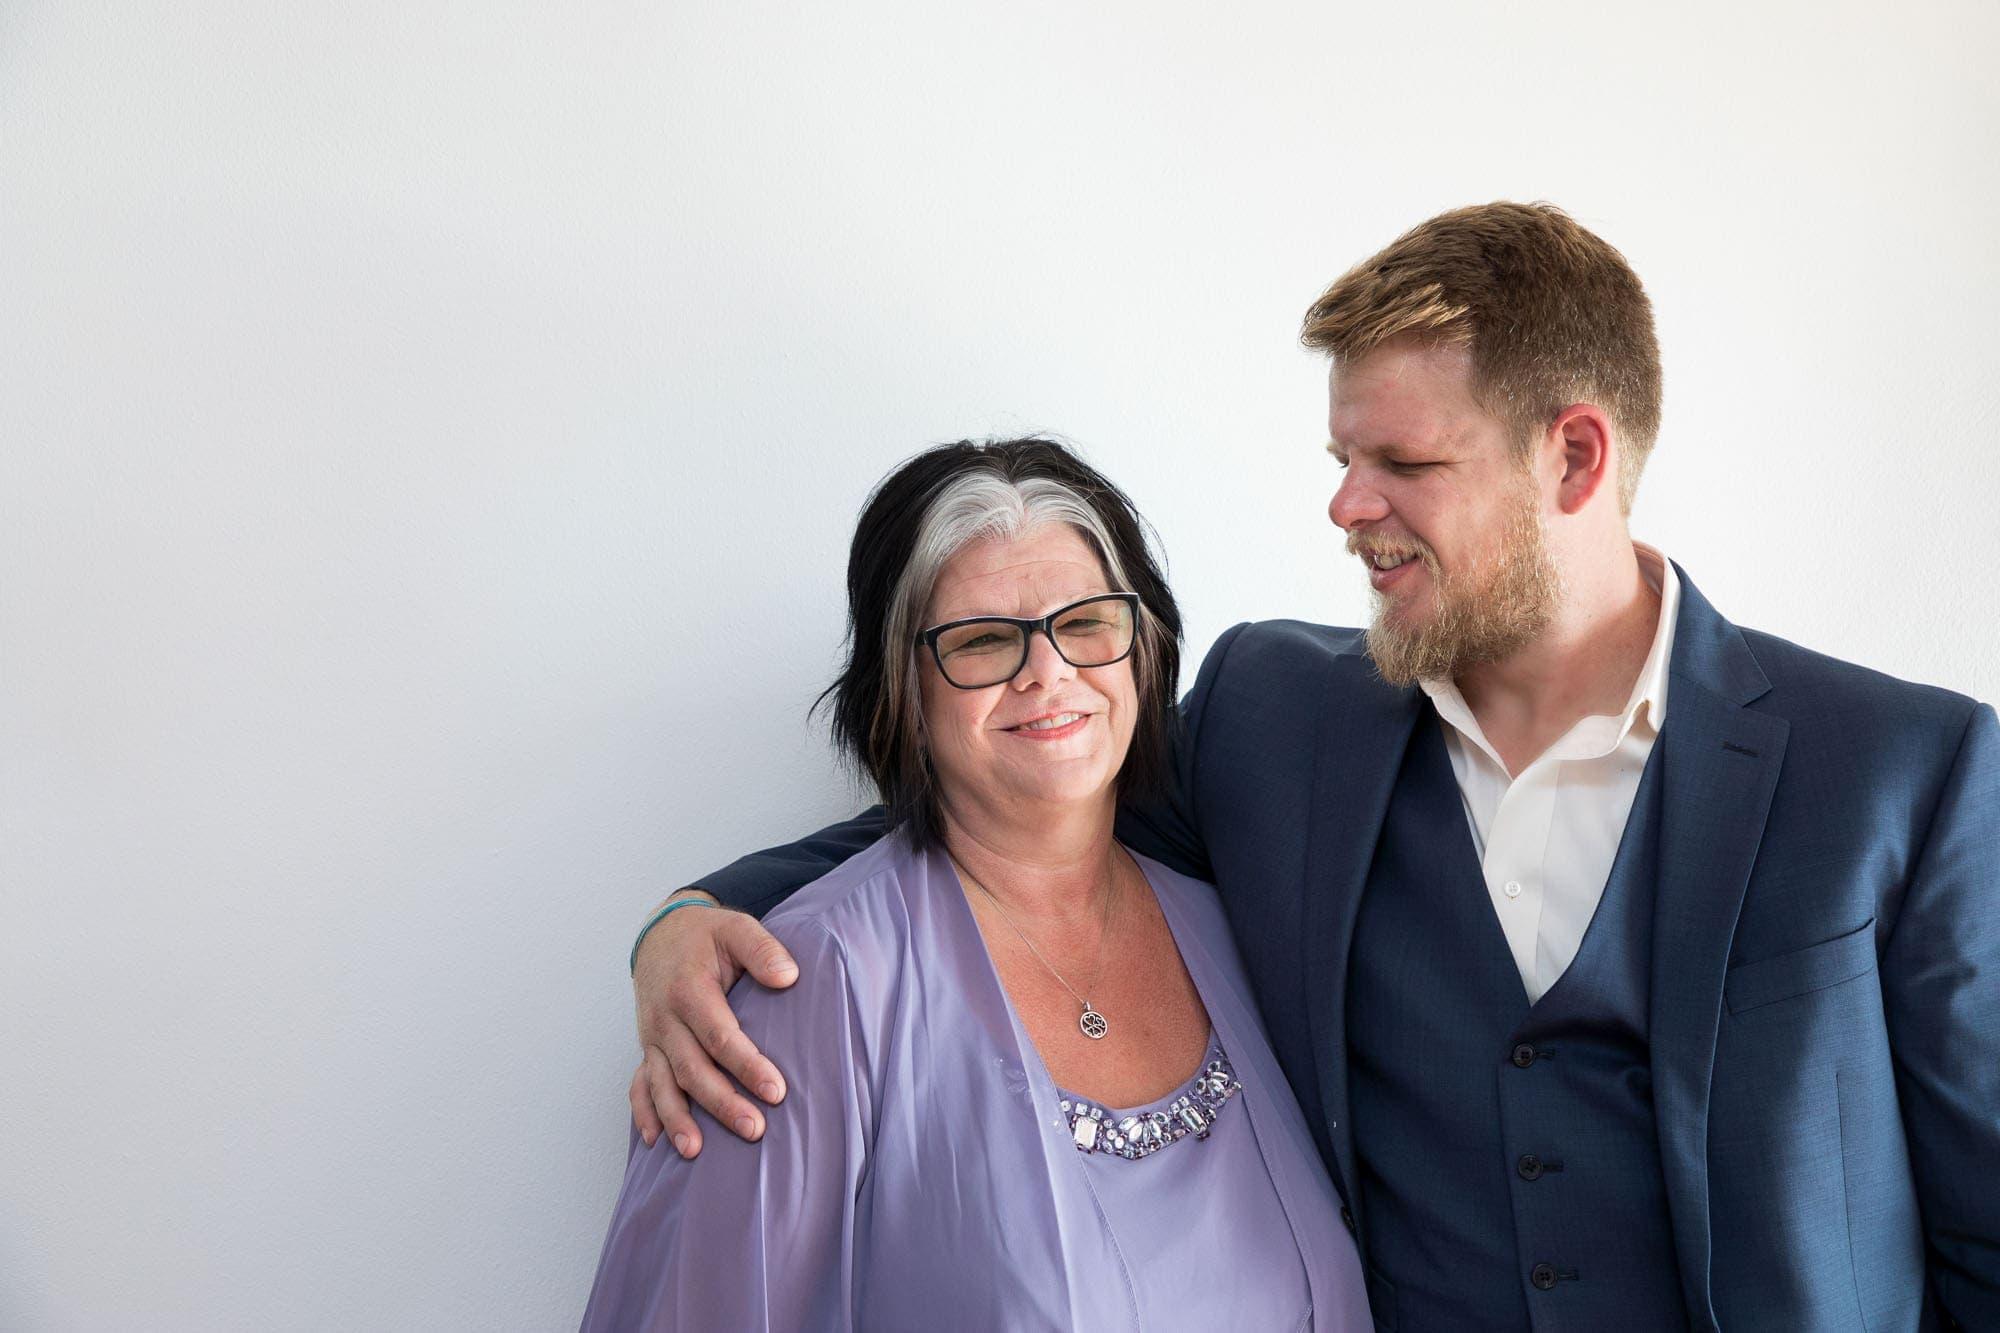 The groom with his mom before the joyful wedding ceremony